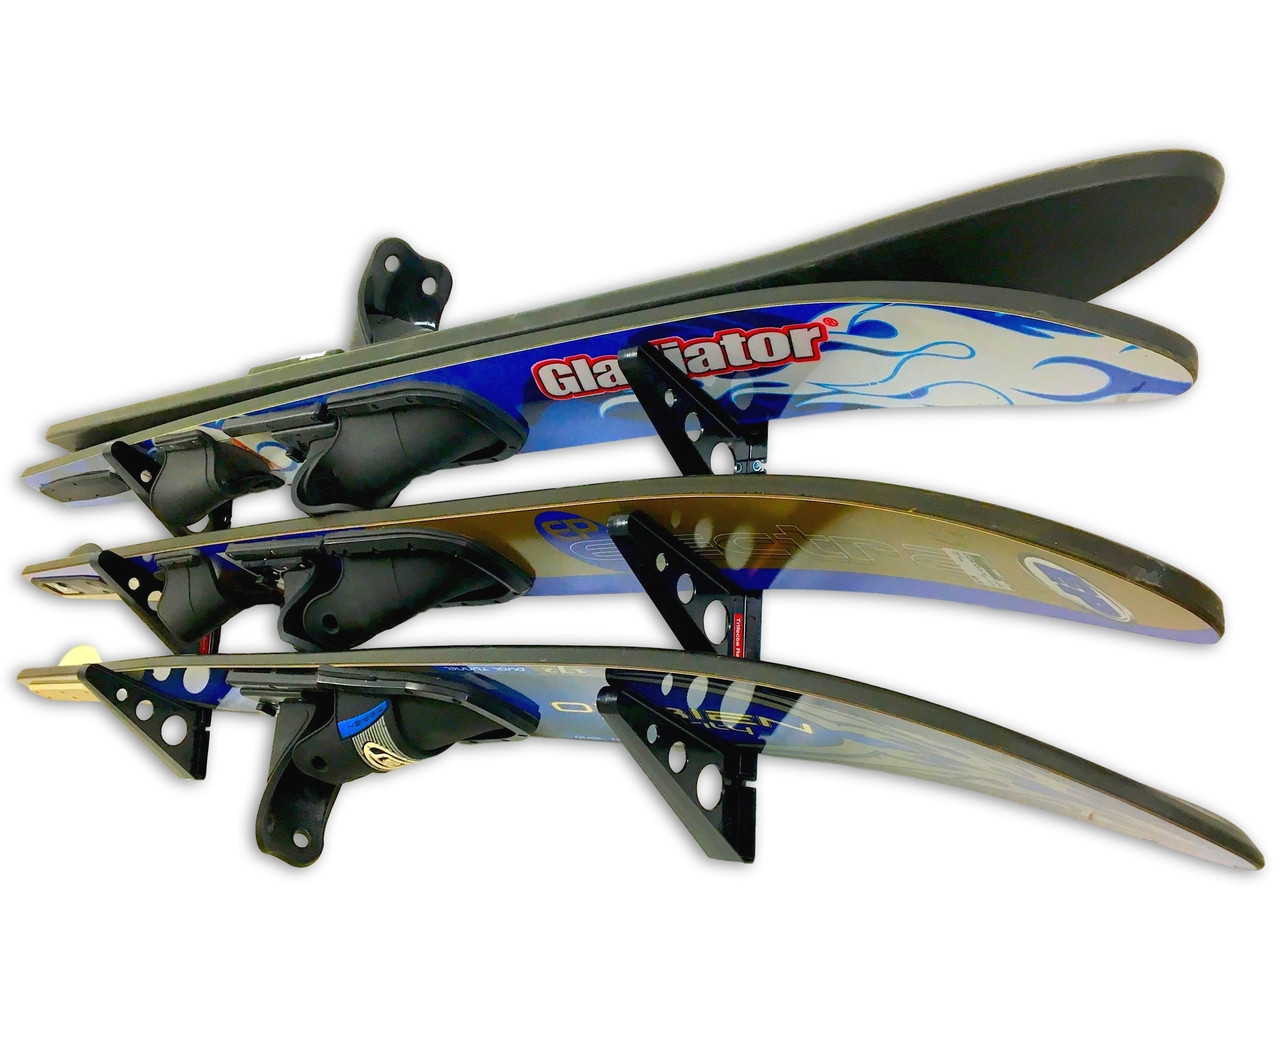 Water Ski Wall Storage | Trifecta Rack | Holds 2 Pairs of Skis